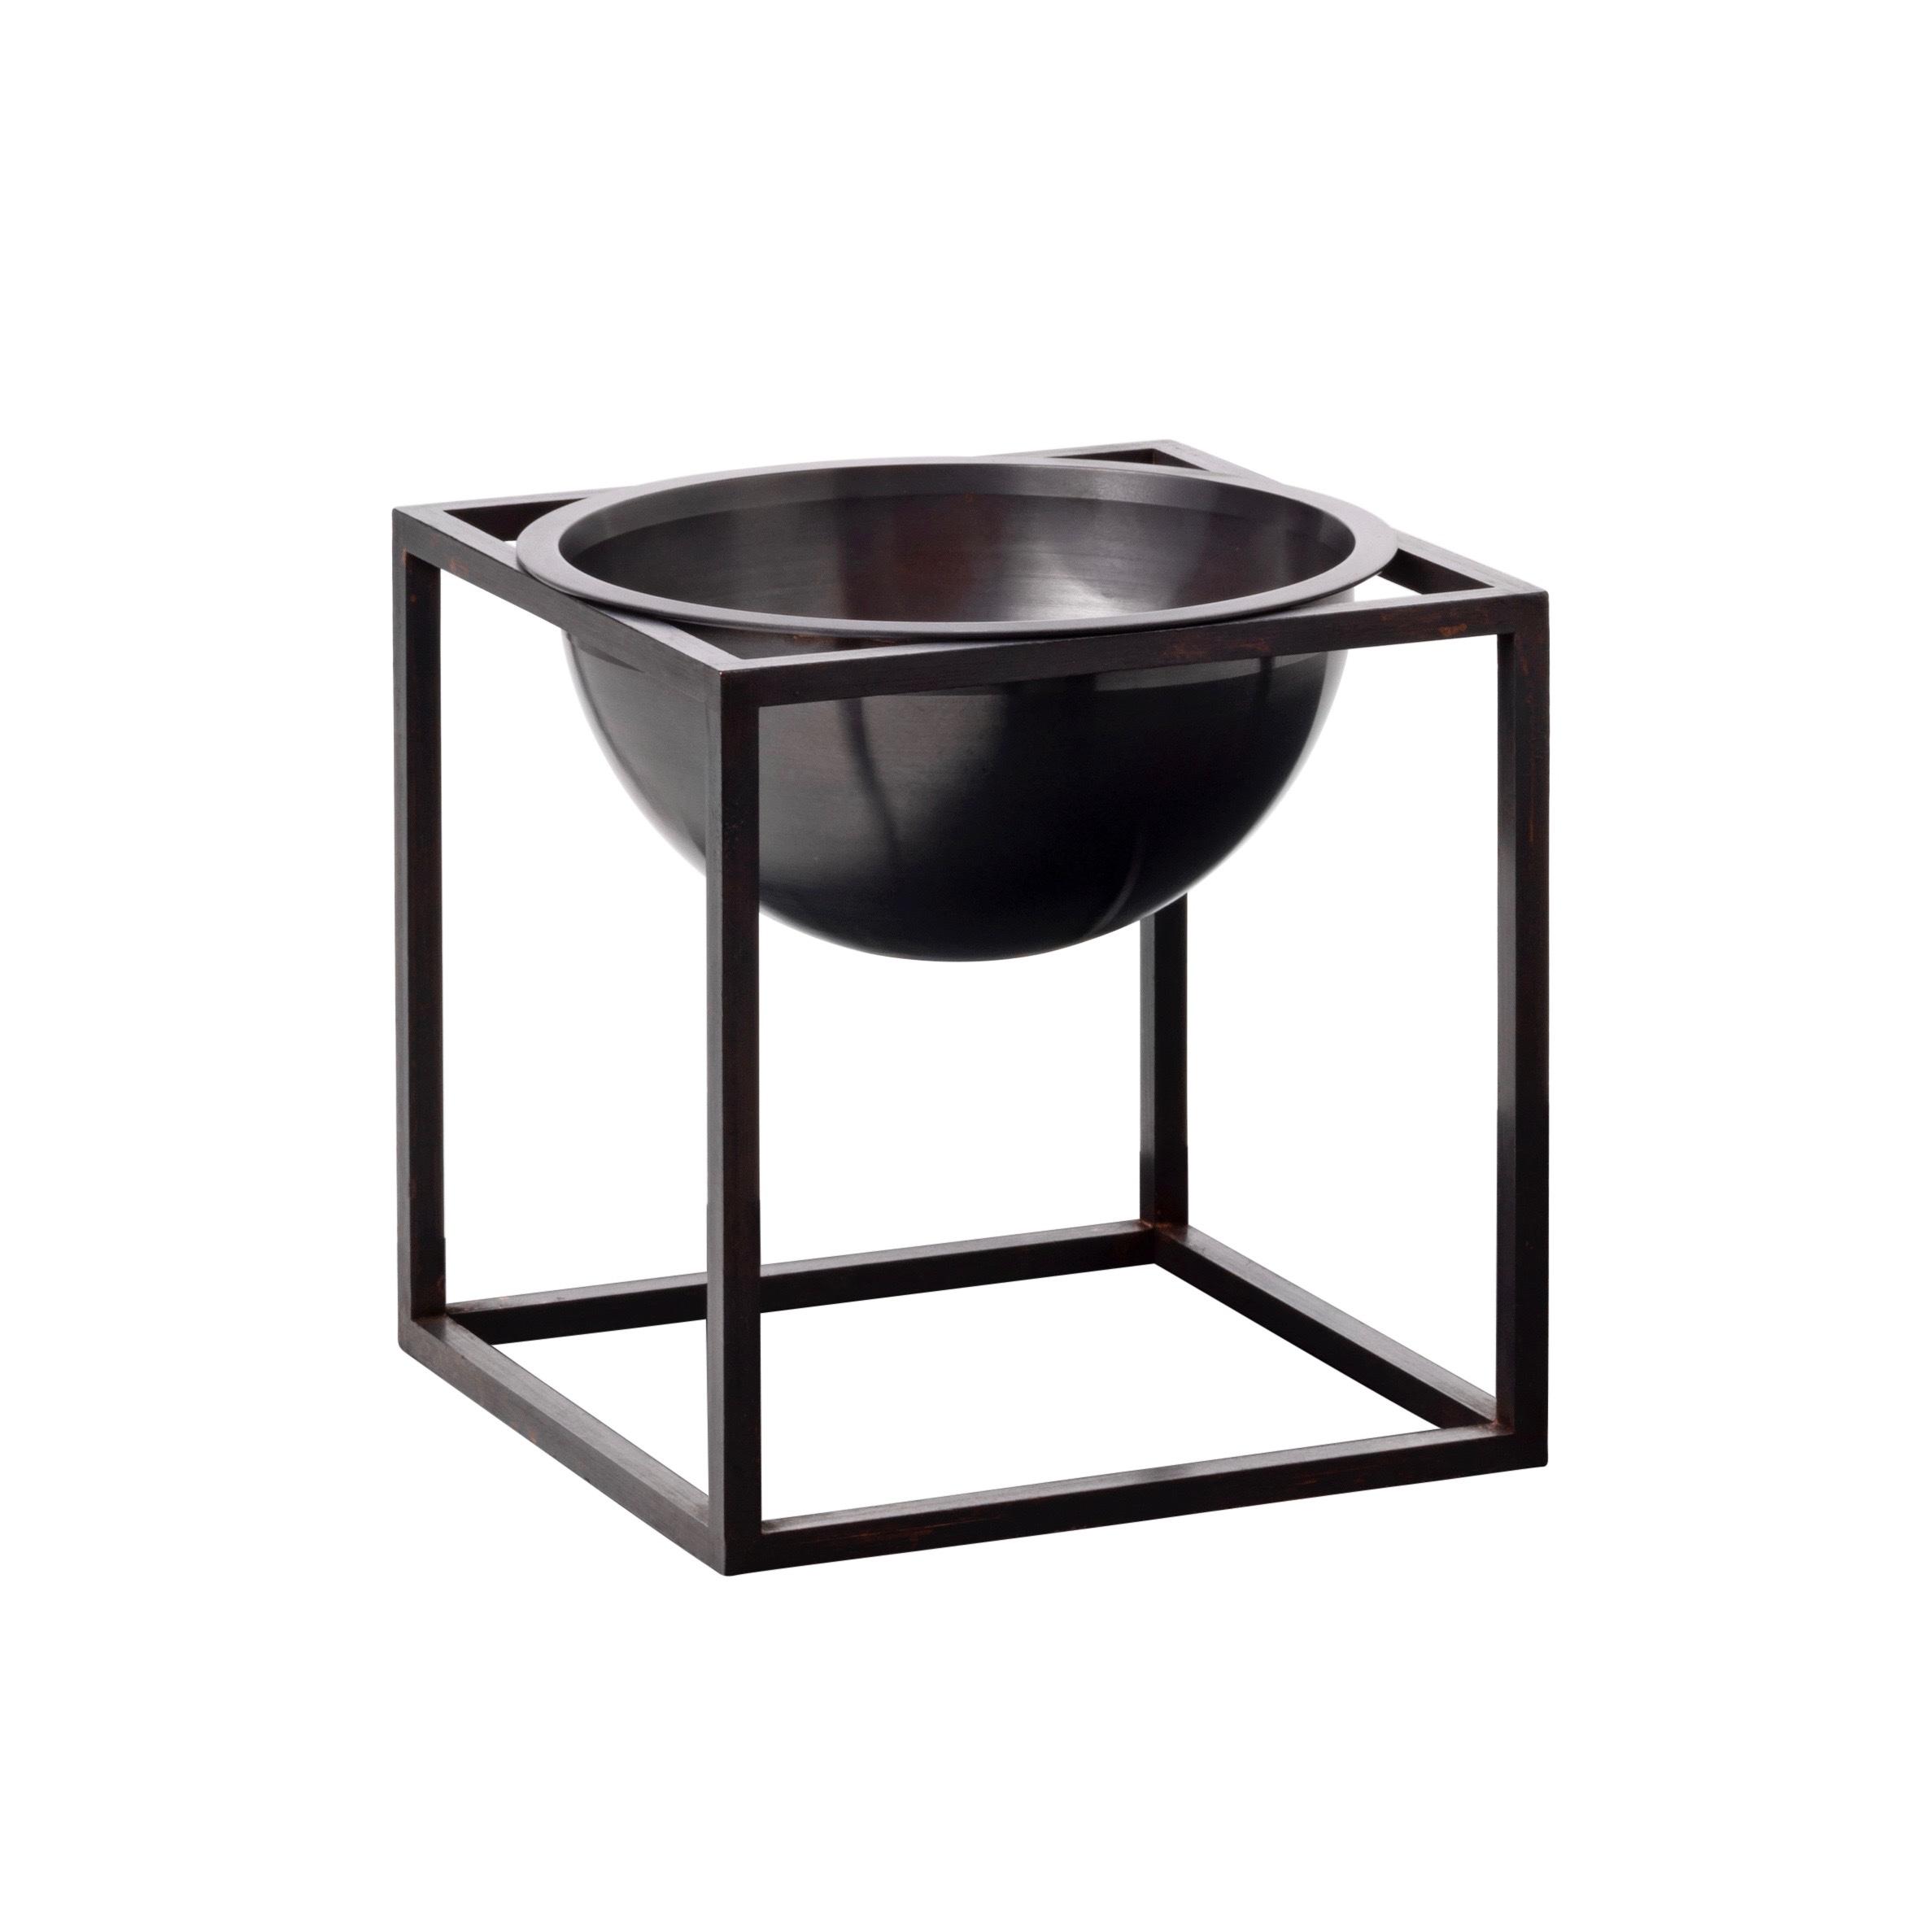 Kubus bowl liten bränd koppar